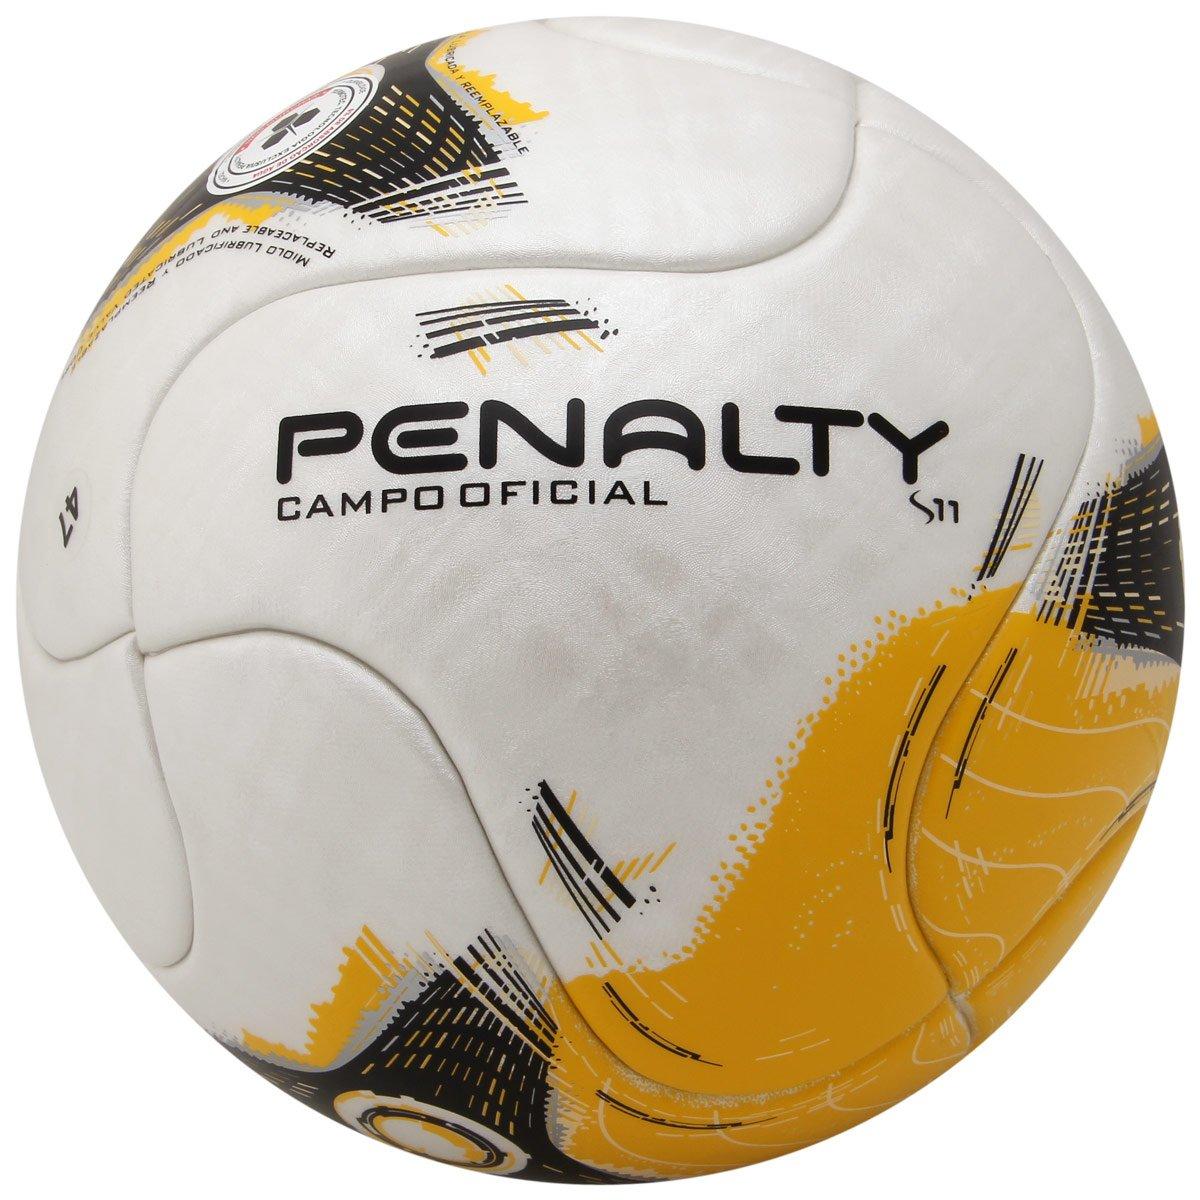 Bola Futebol Penalty S11 R1 Campo - Compre Agora  bb22fc56575c7